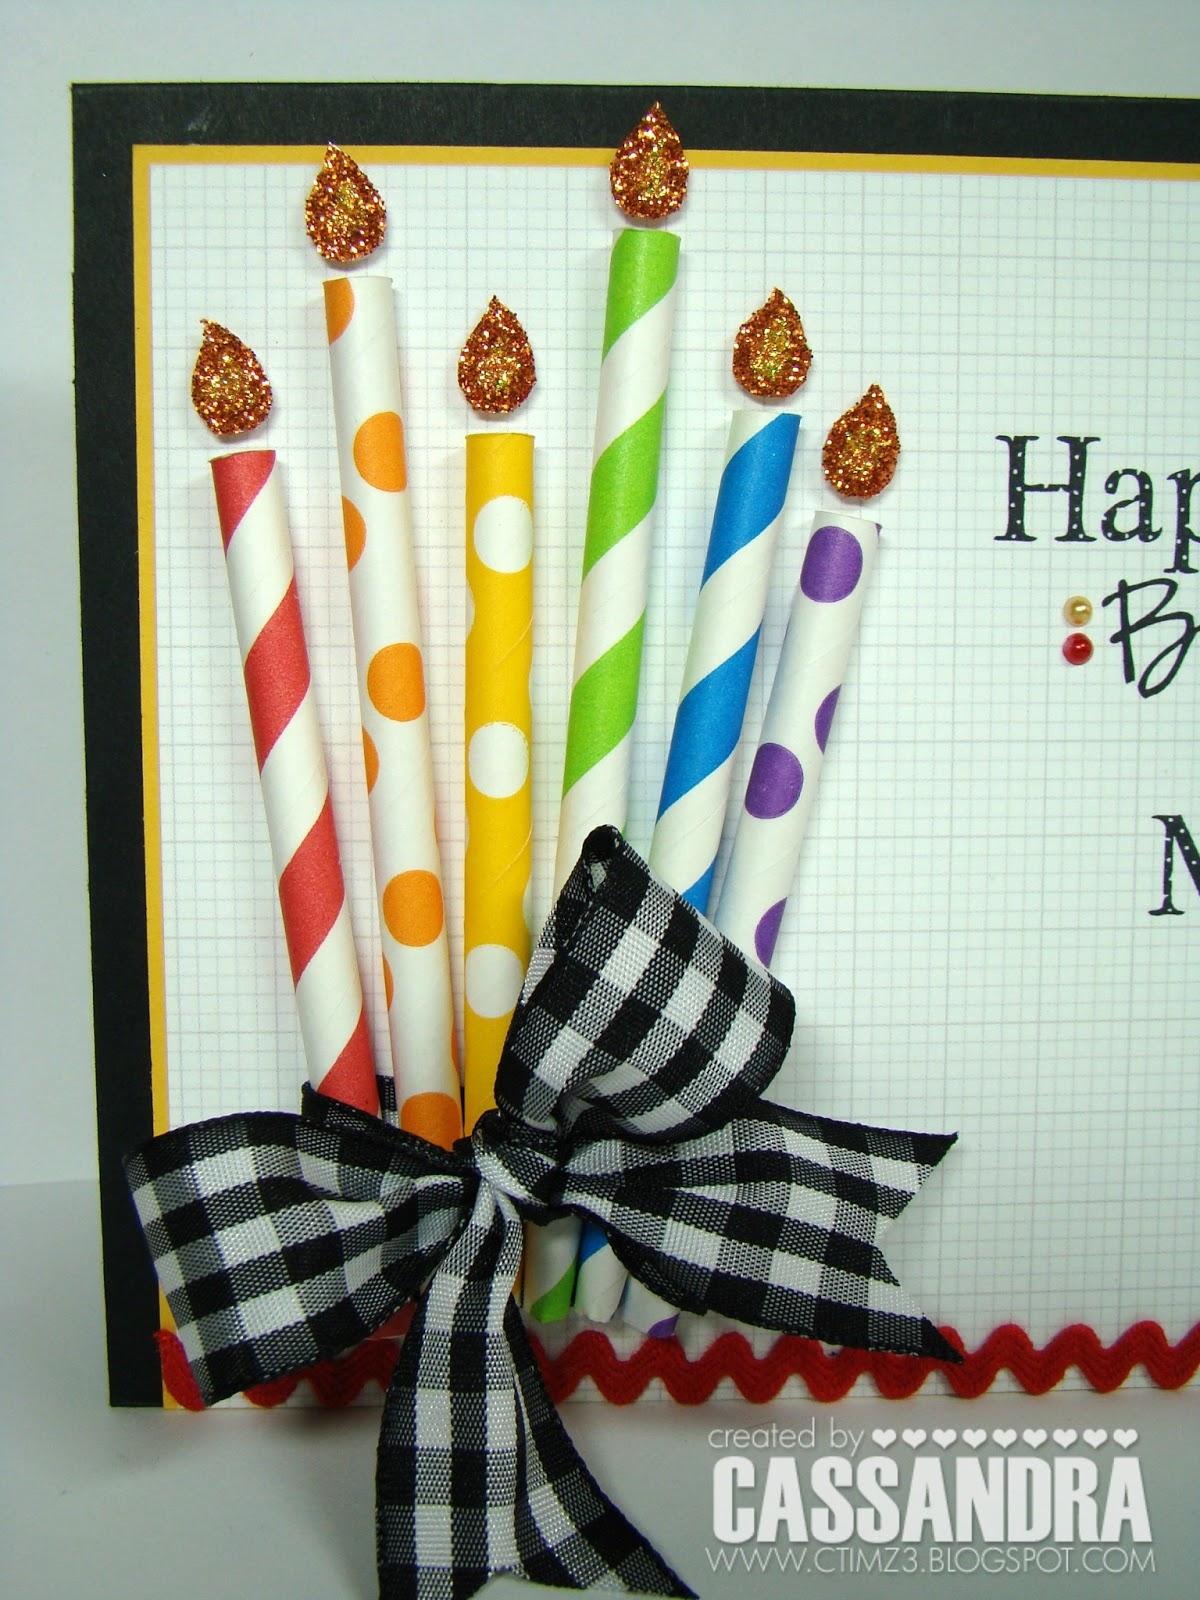 My Creative Time Birthday Bash Blog Hop on Cupcake Birthday Wall